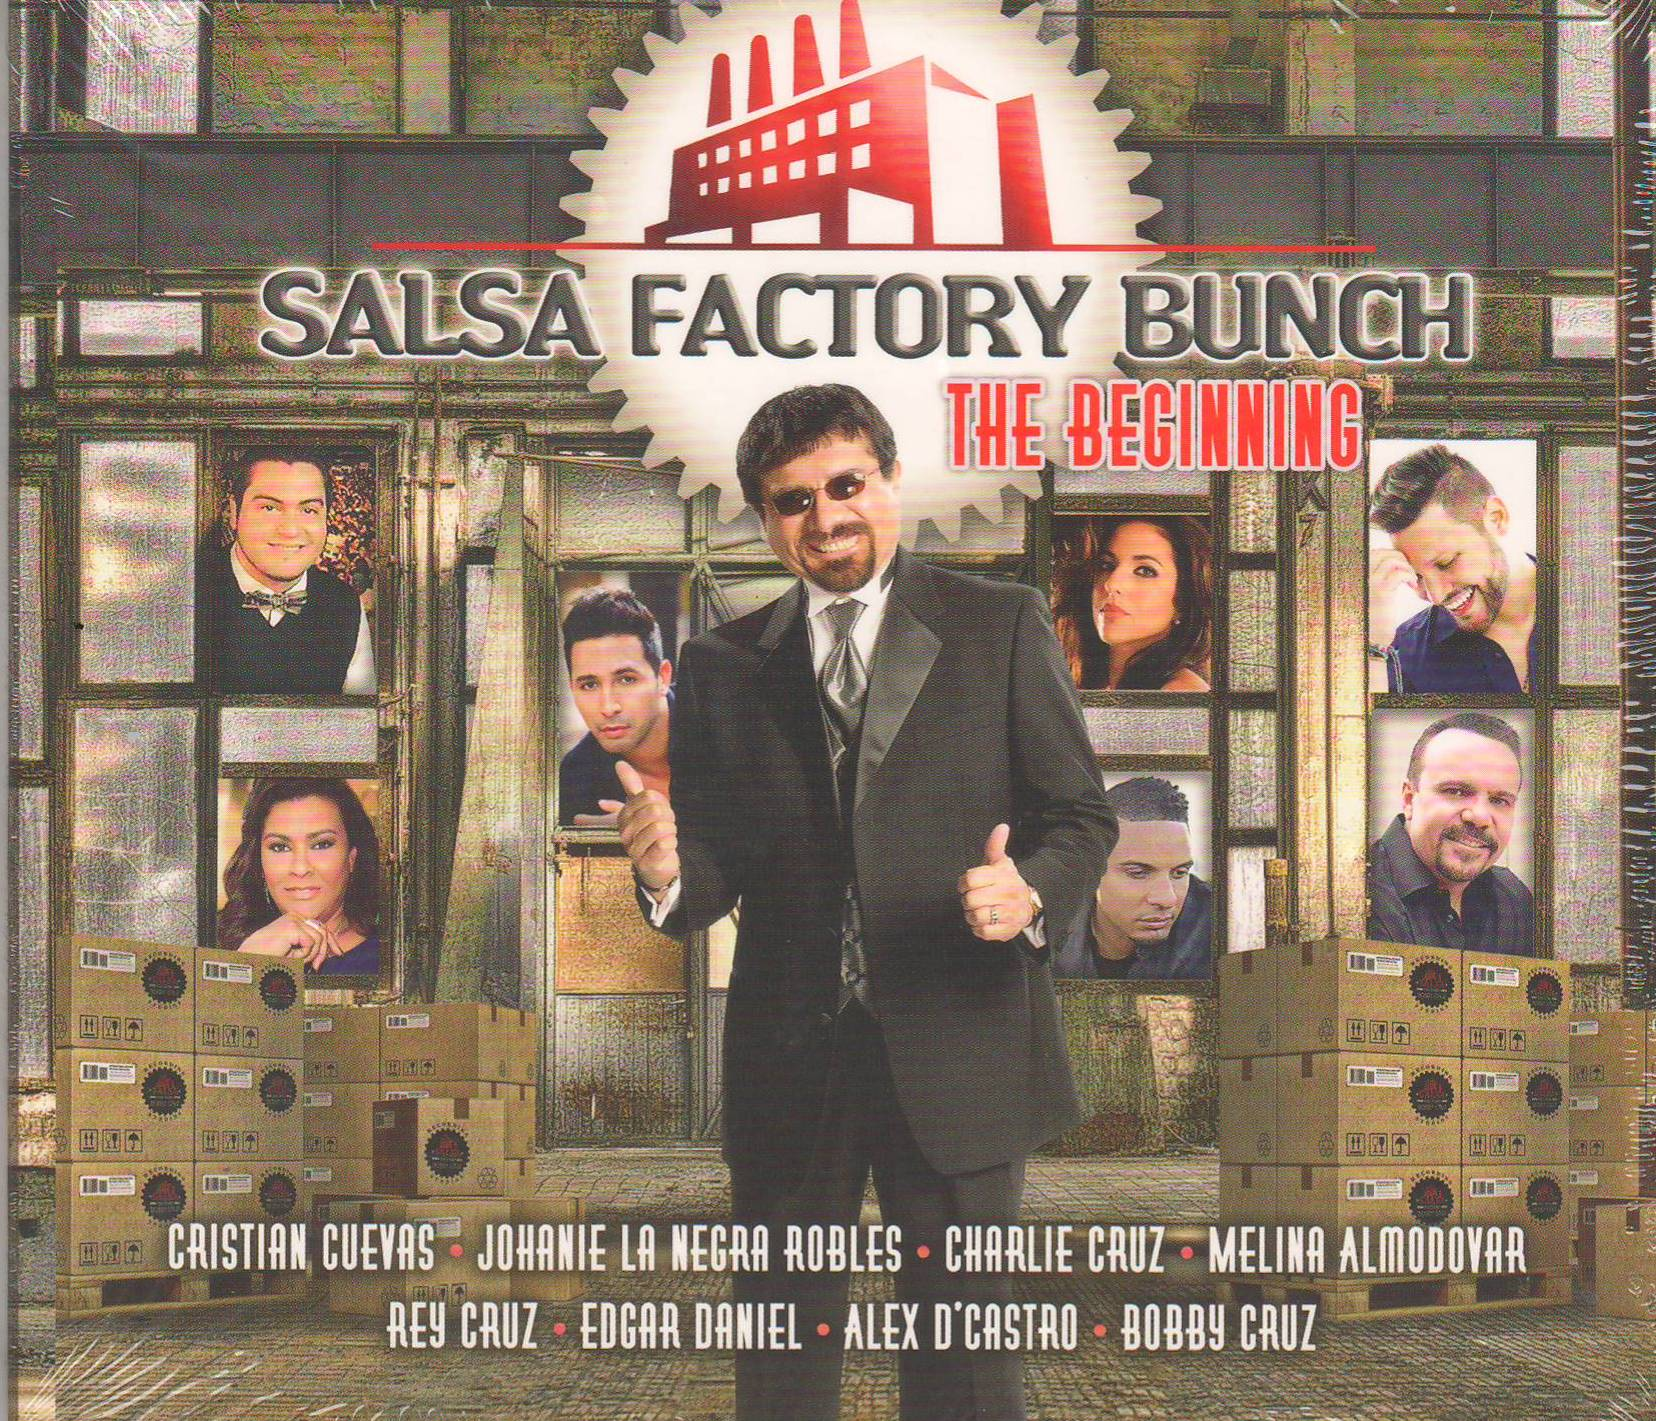 salsa factory bunch - 2016 - the begining